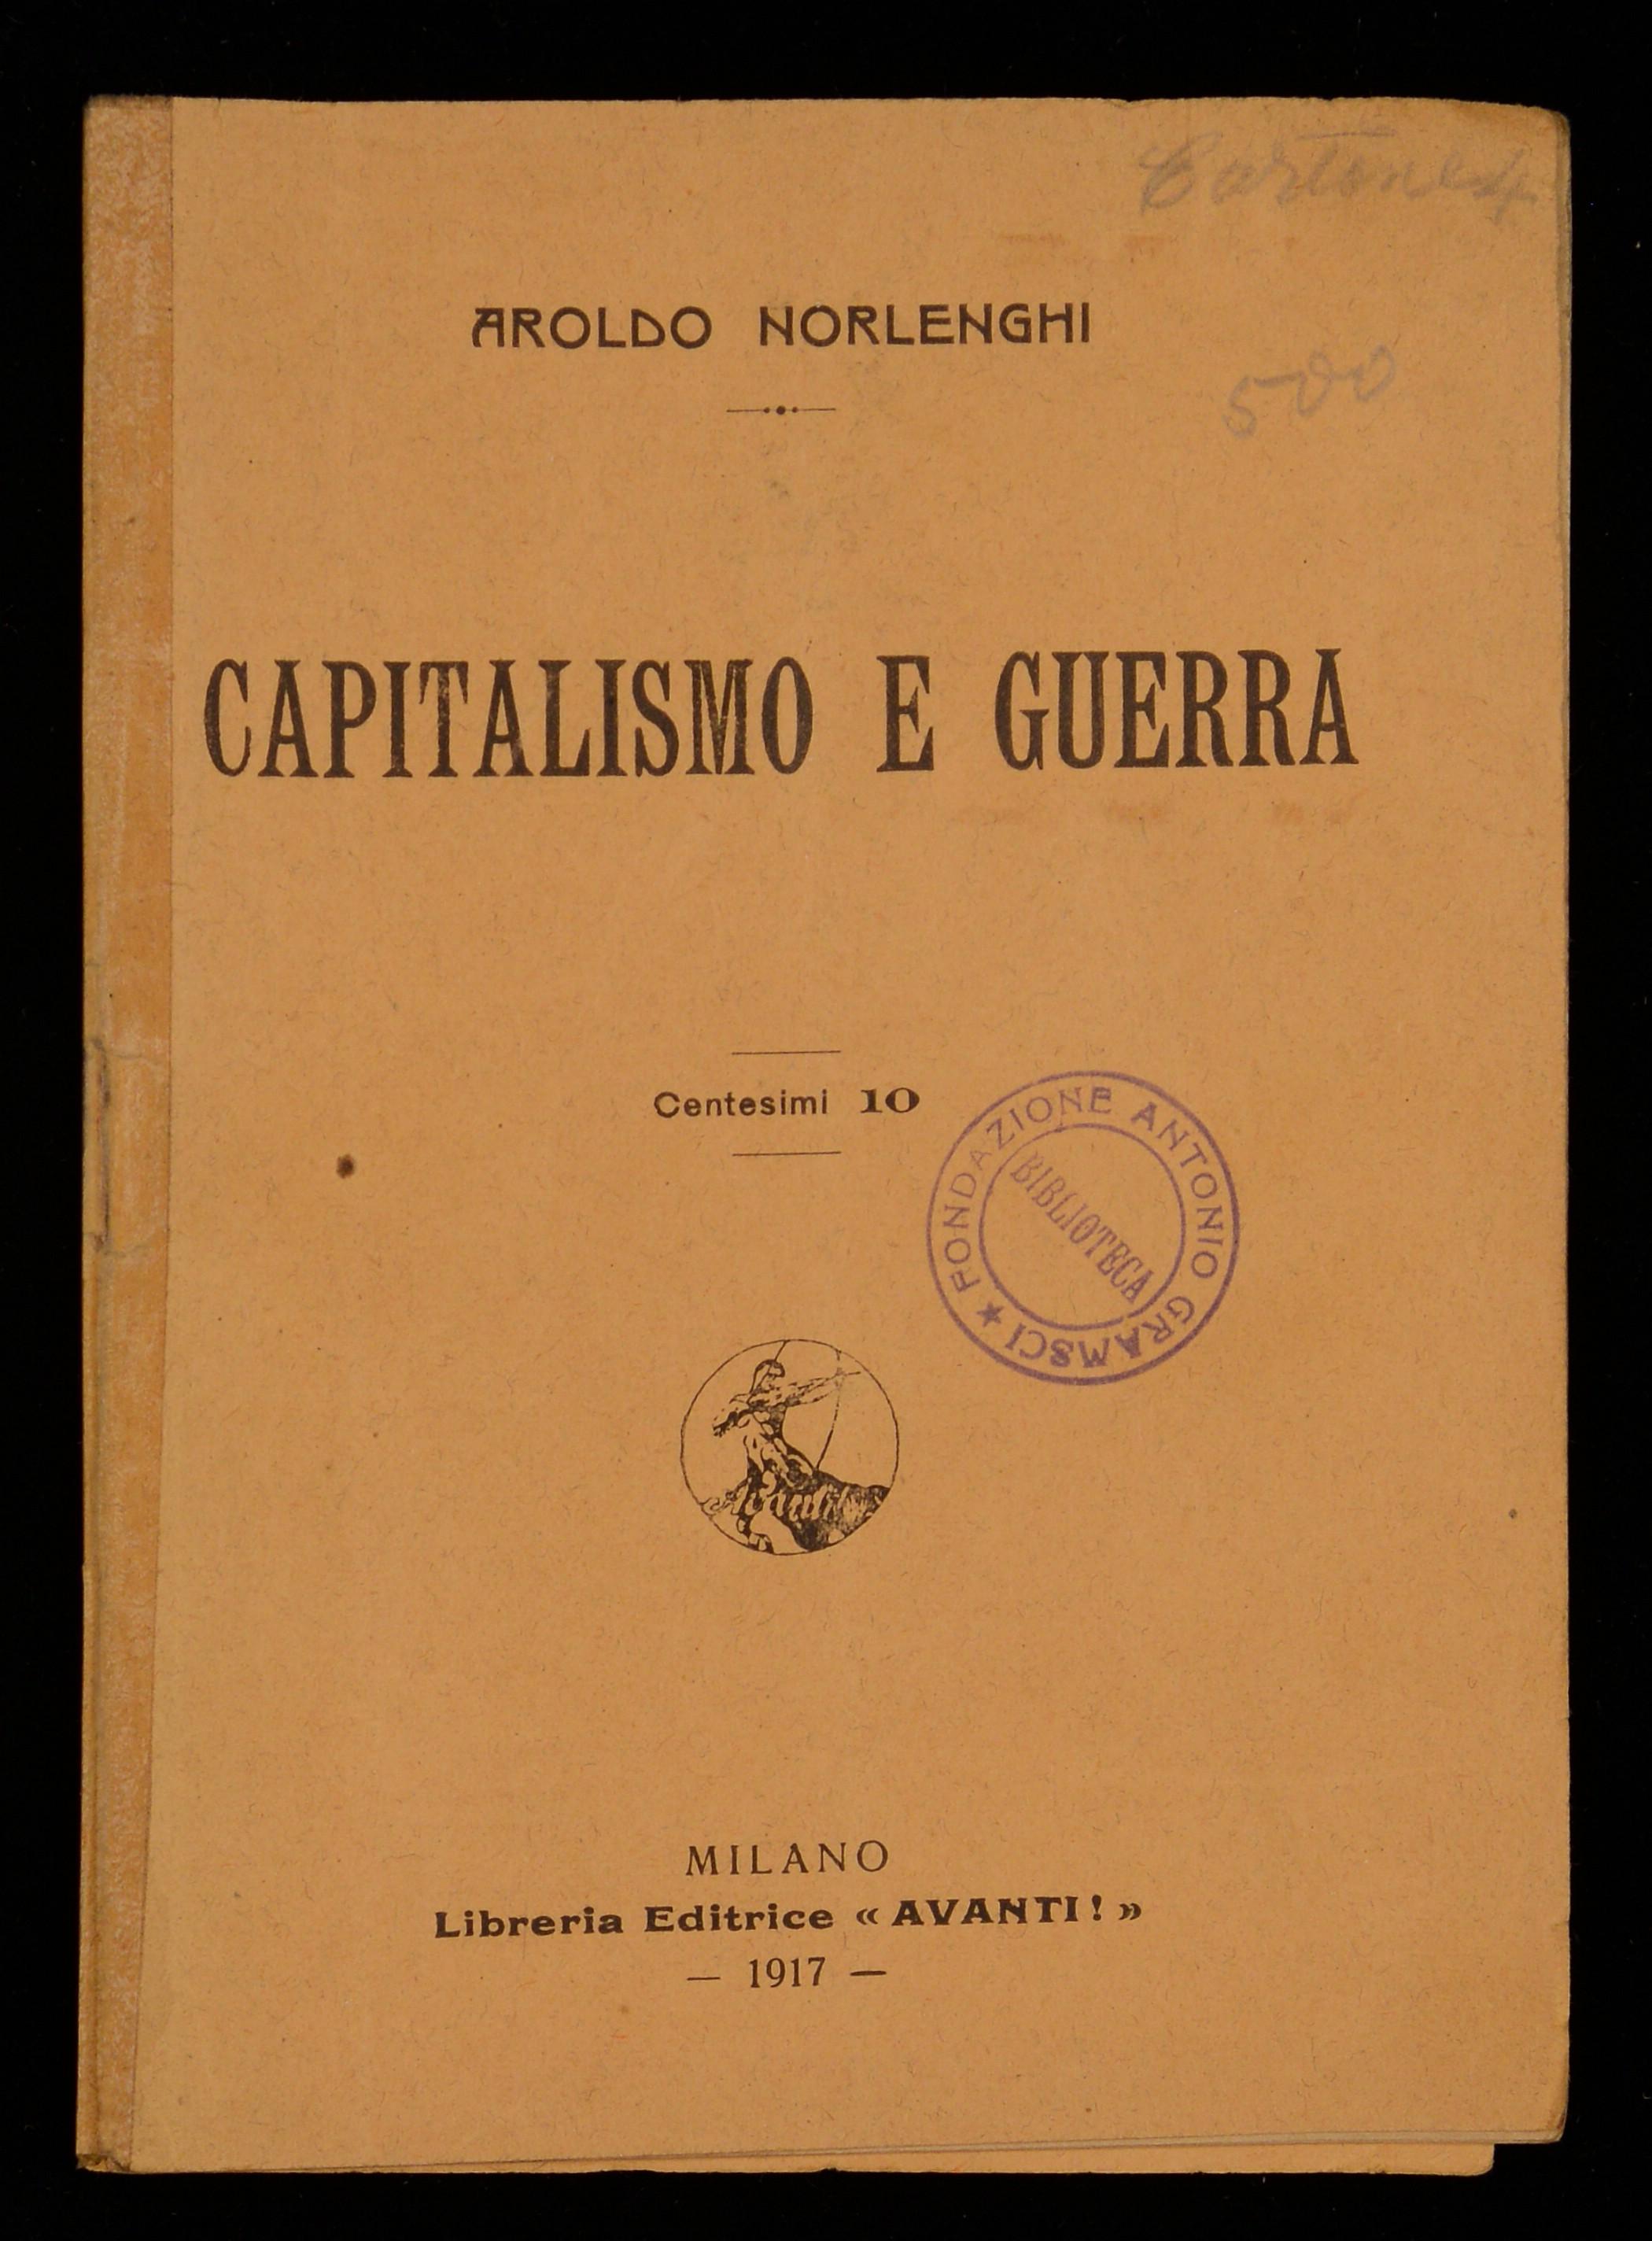 Capitalismo e guerra